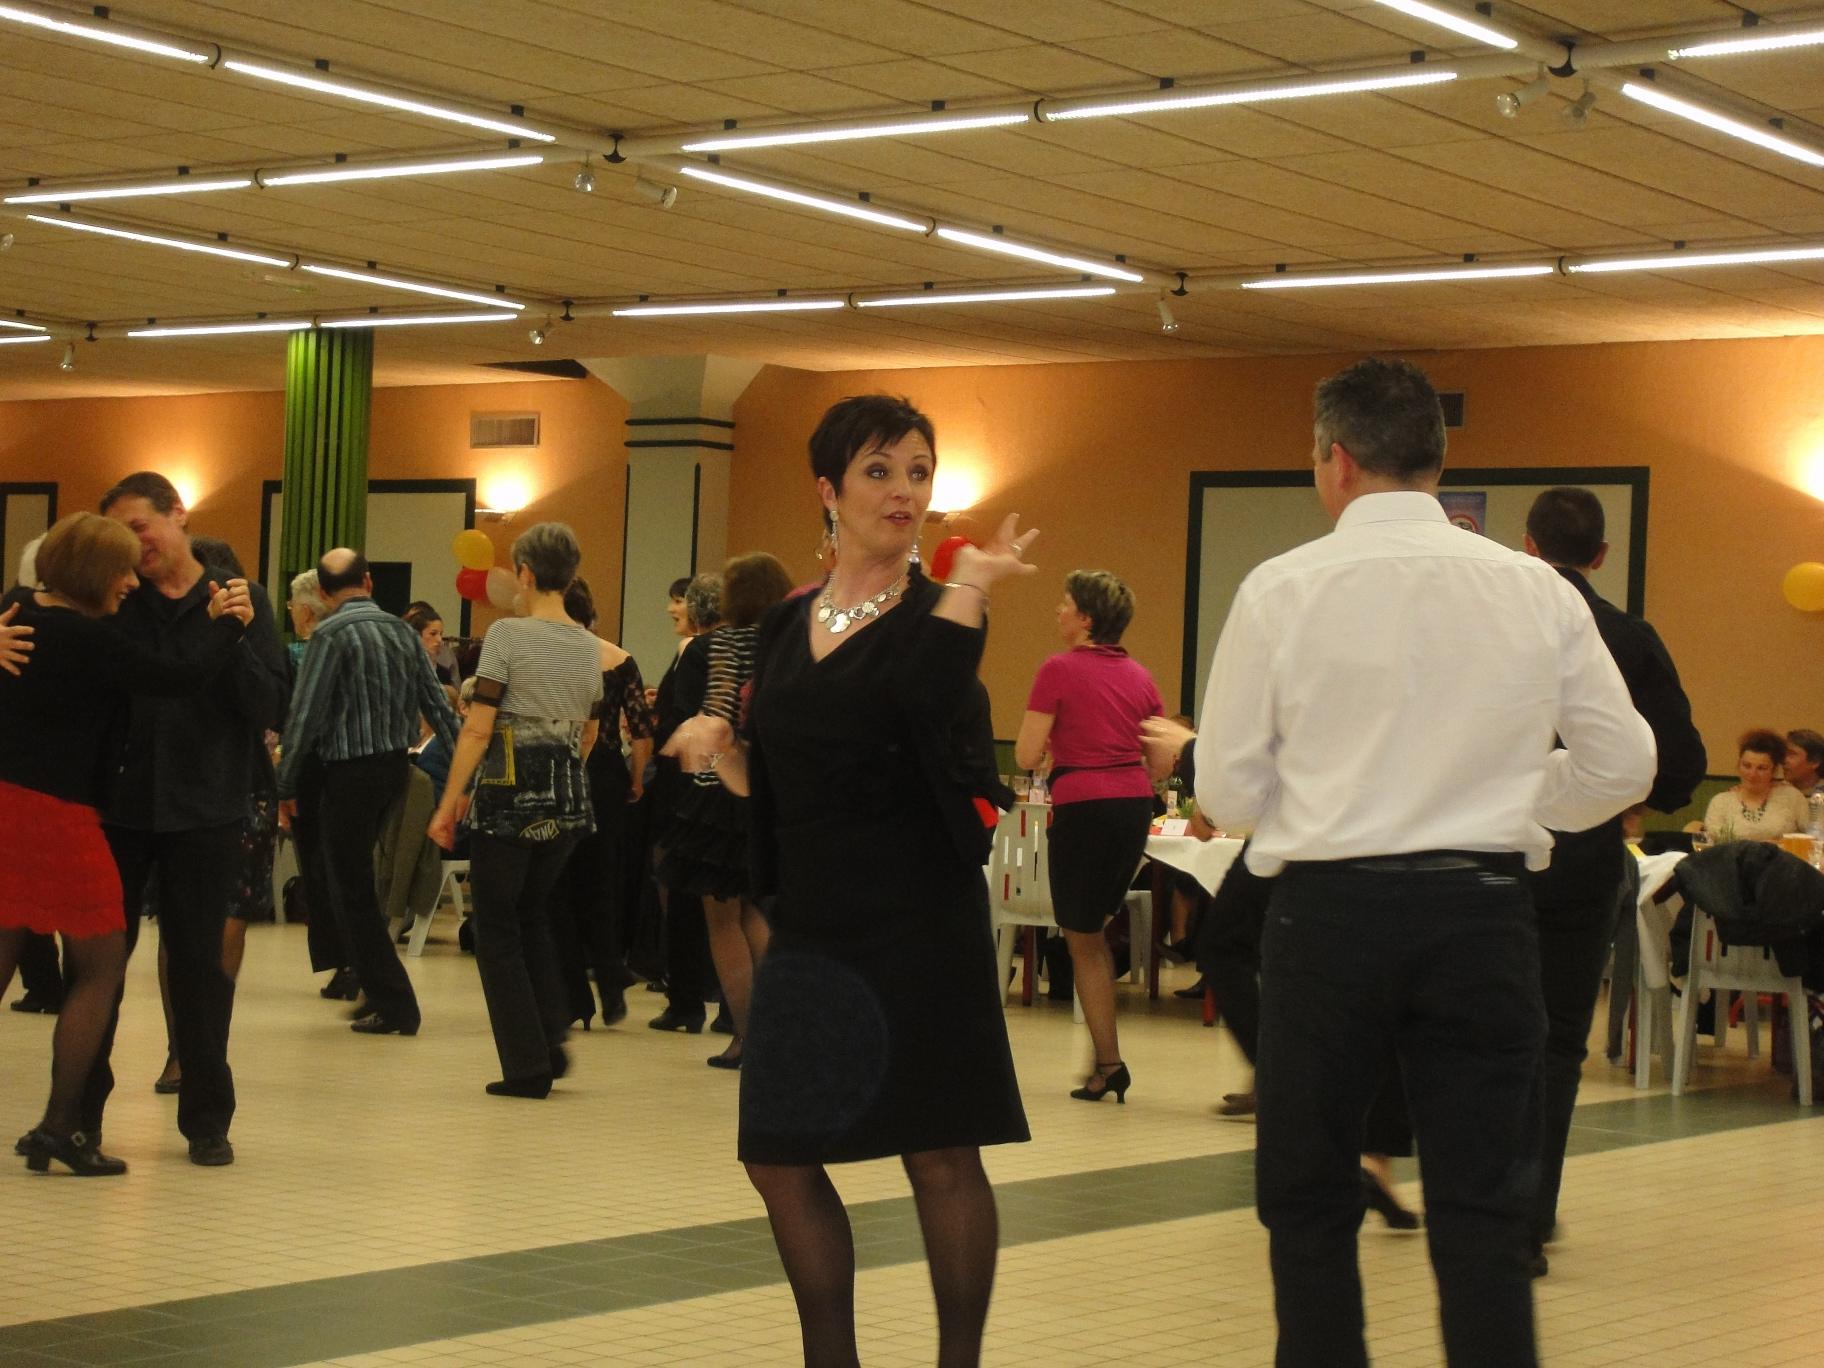 Galerie danse de salon fcl for Danse de salon 95